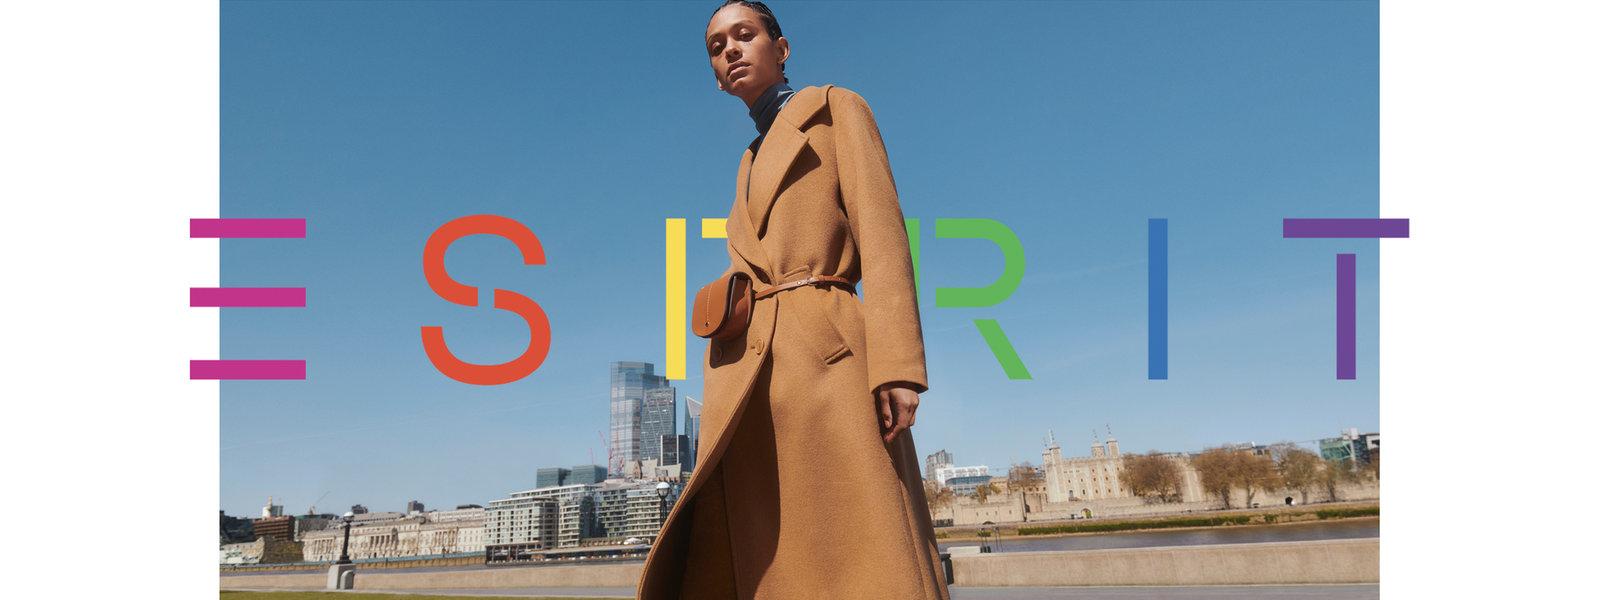 372021--W---Lookbook--Original-Image--Wool coats---Image-01